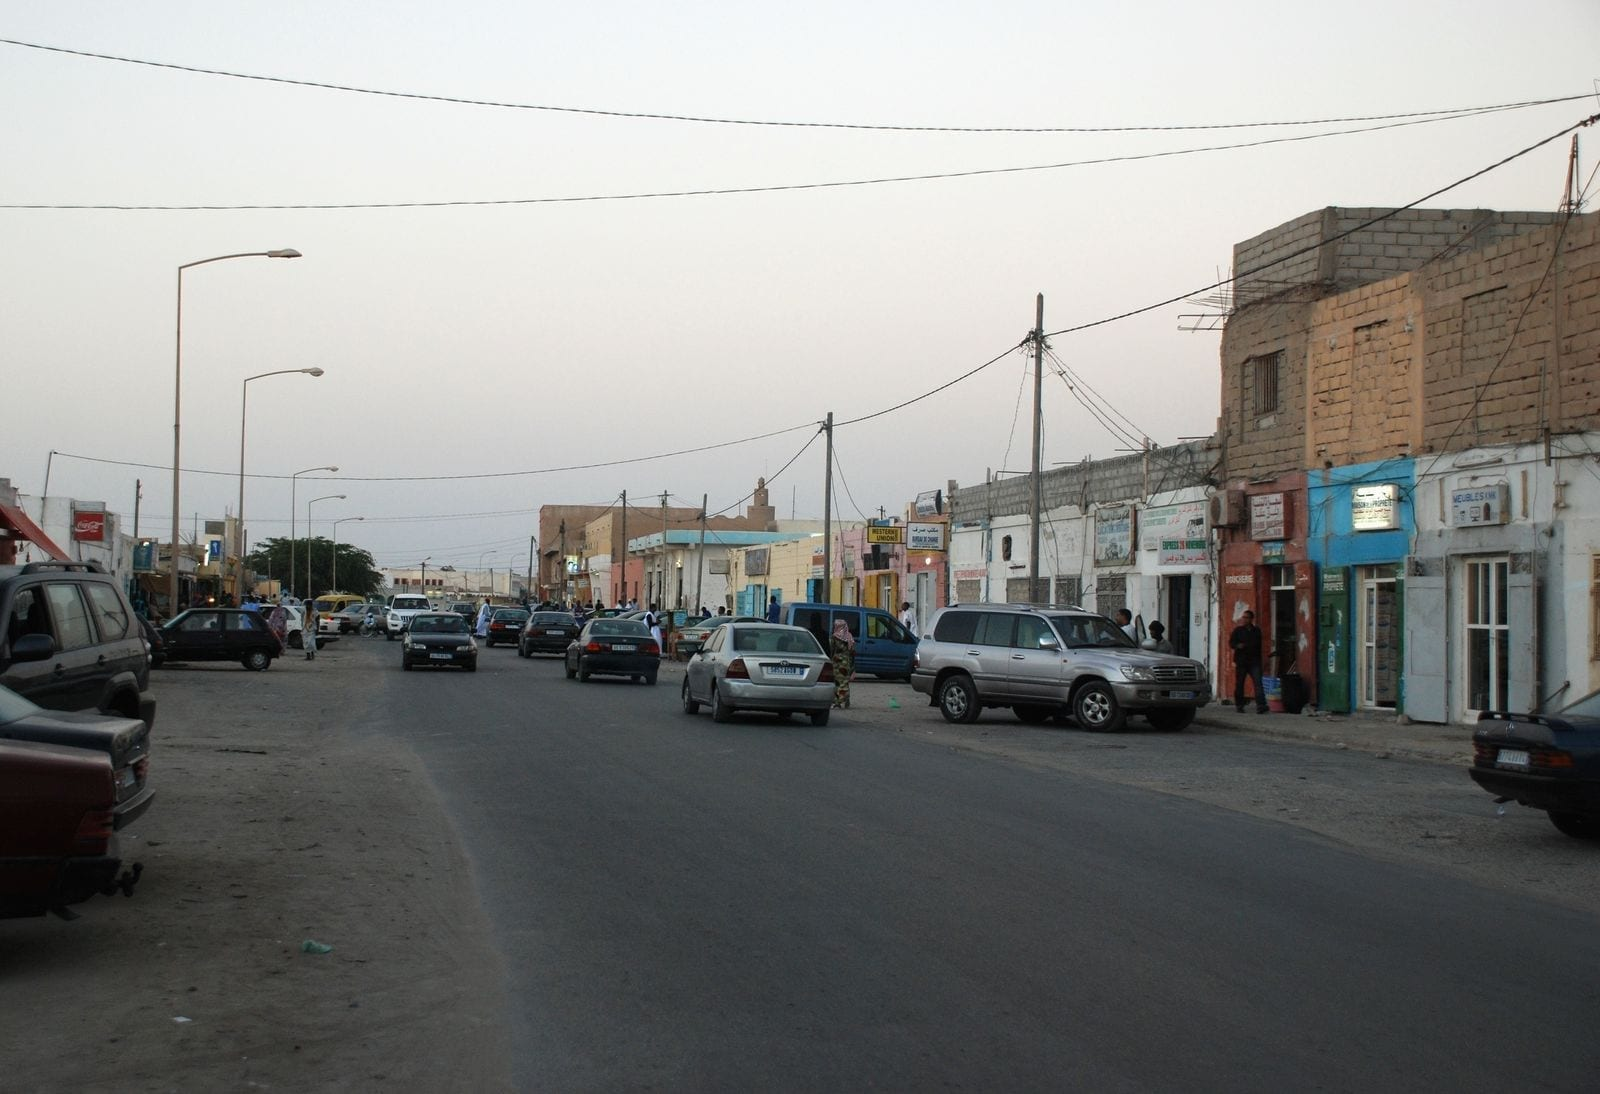 Boulevard Median, la principal calle comercial Mauritania